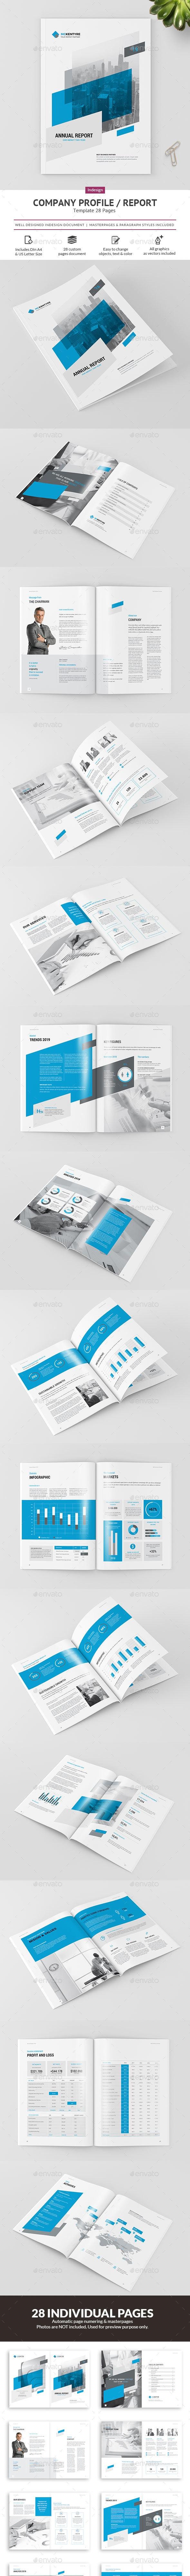 Company Profile / Annual Report - Brochures Print Templates